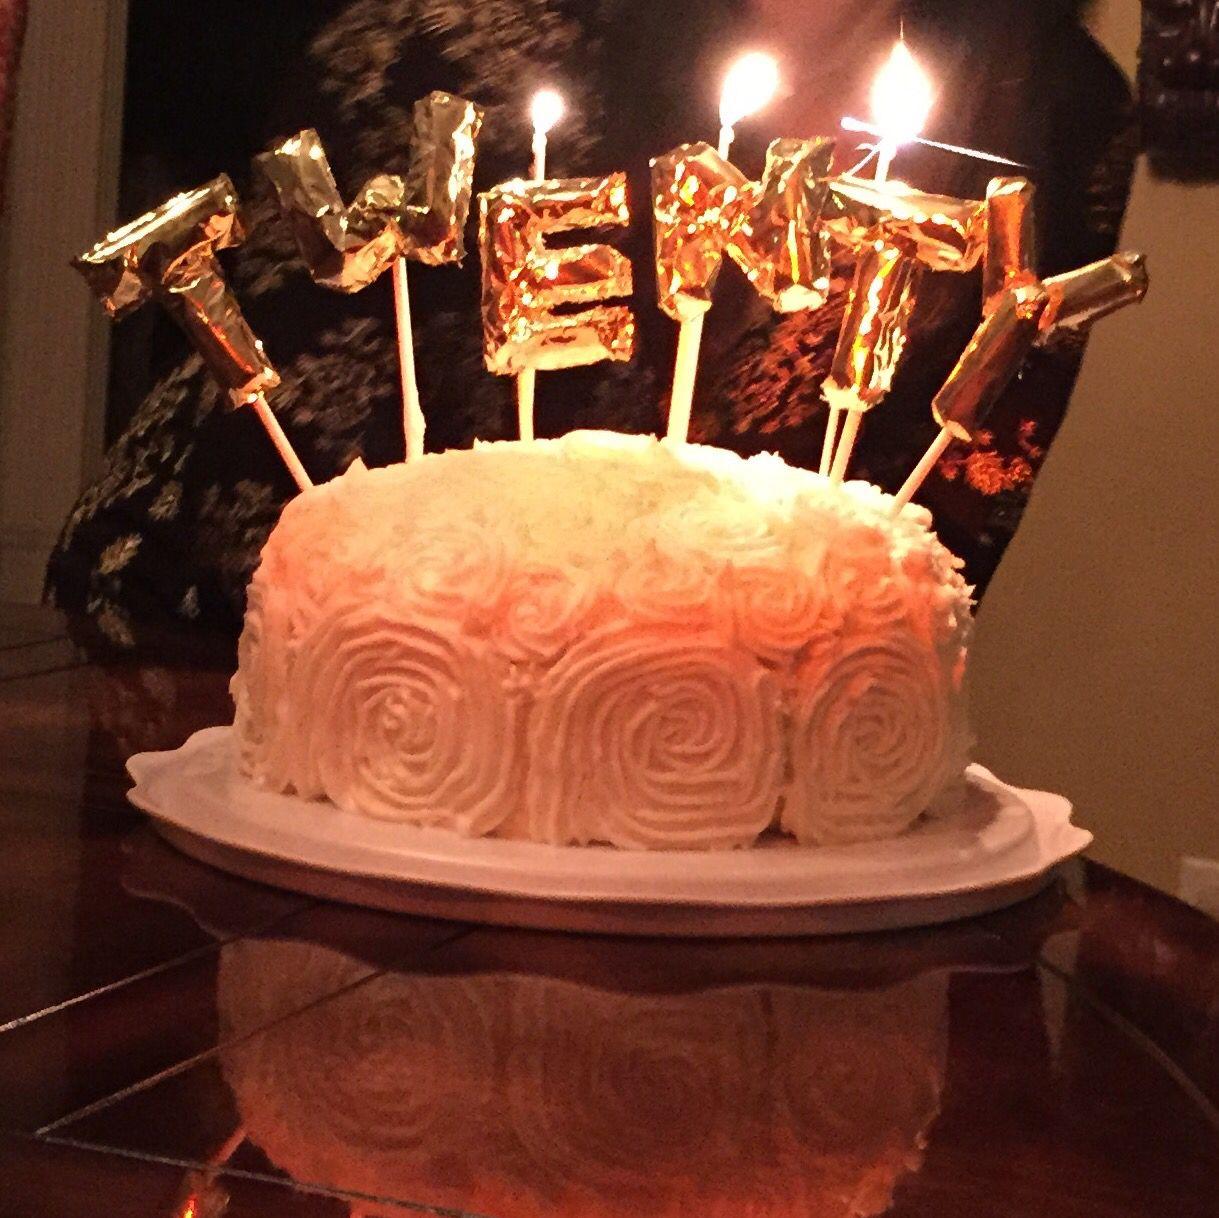 20th birthday cake mini mylar balloon cake toppers see